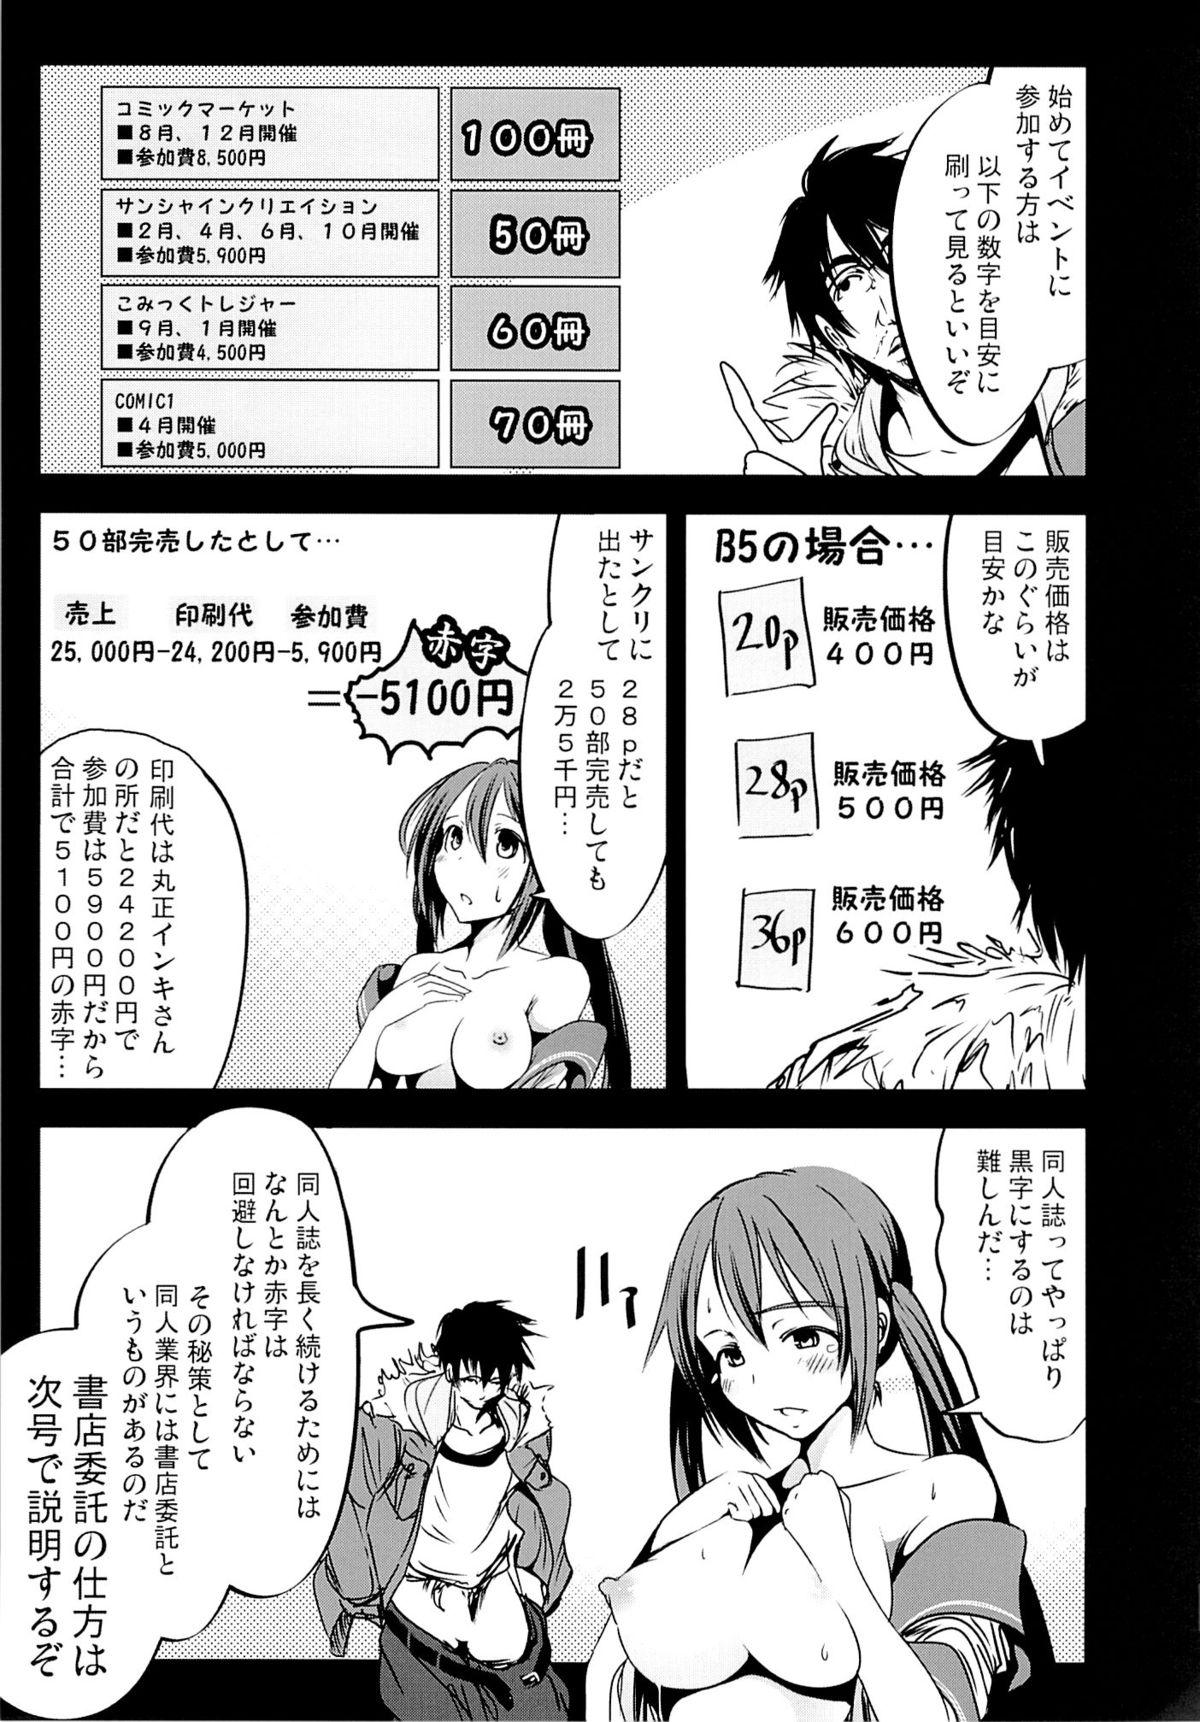 H na Doujinshi no Kakikata 25